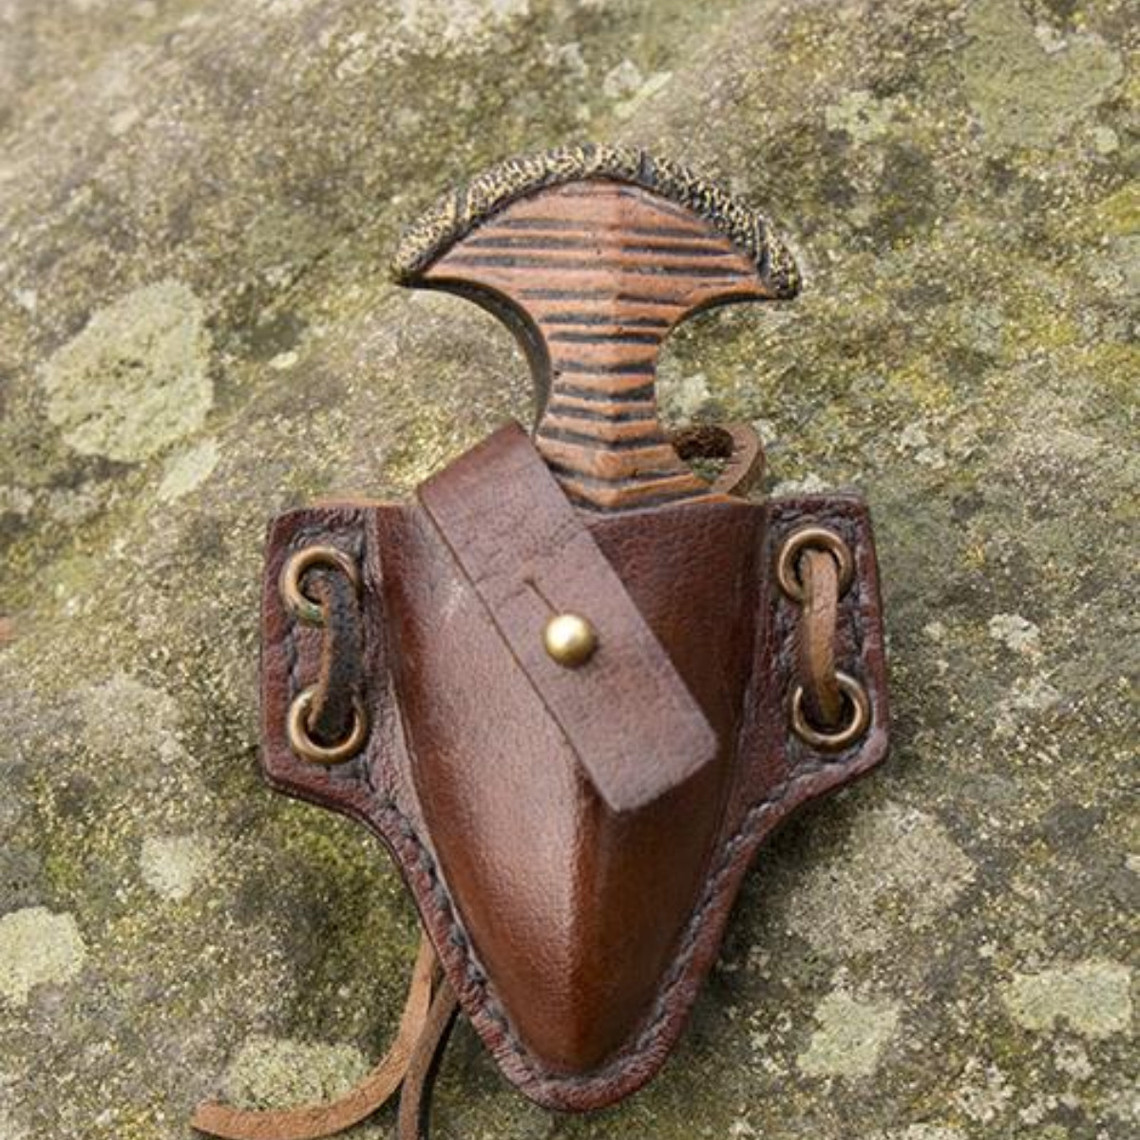 Epic Armoury LARP håndled dolk med holder, brun